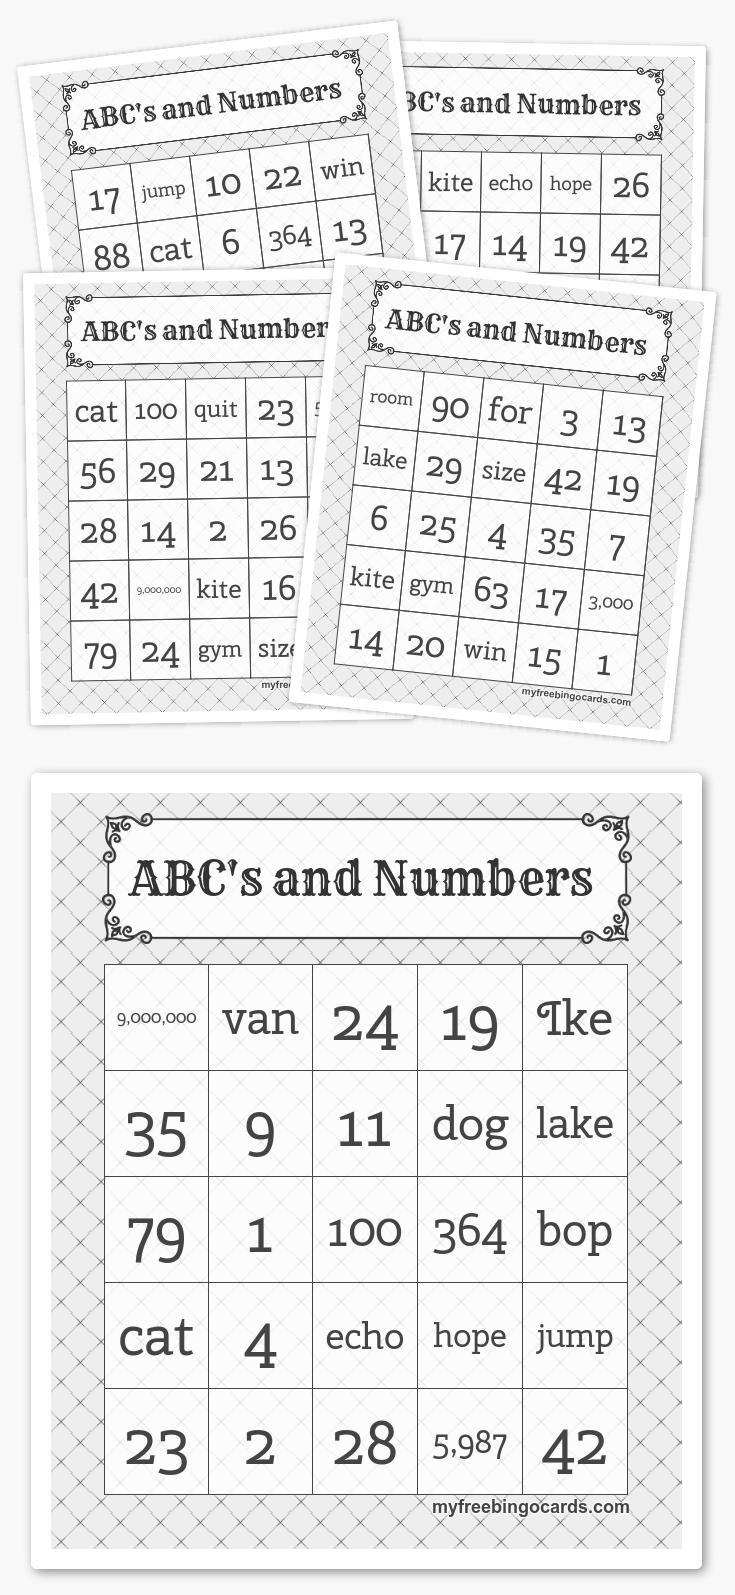 Abc's And Numbers Bingo | Free Printable Bingo Cards, Bingo